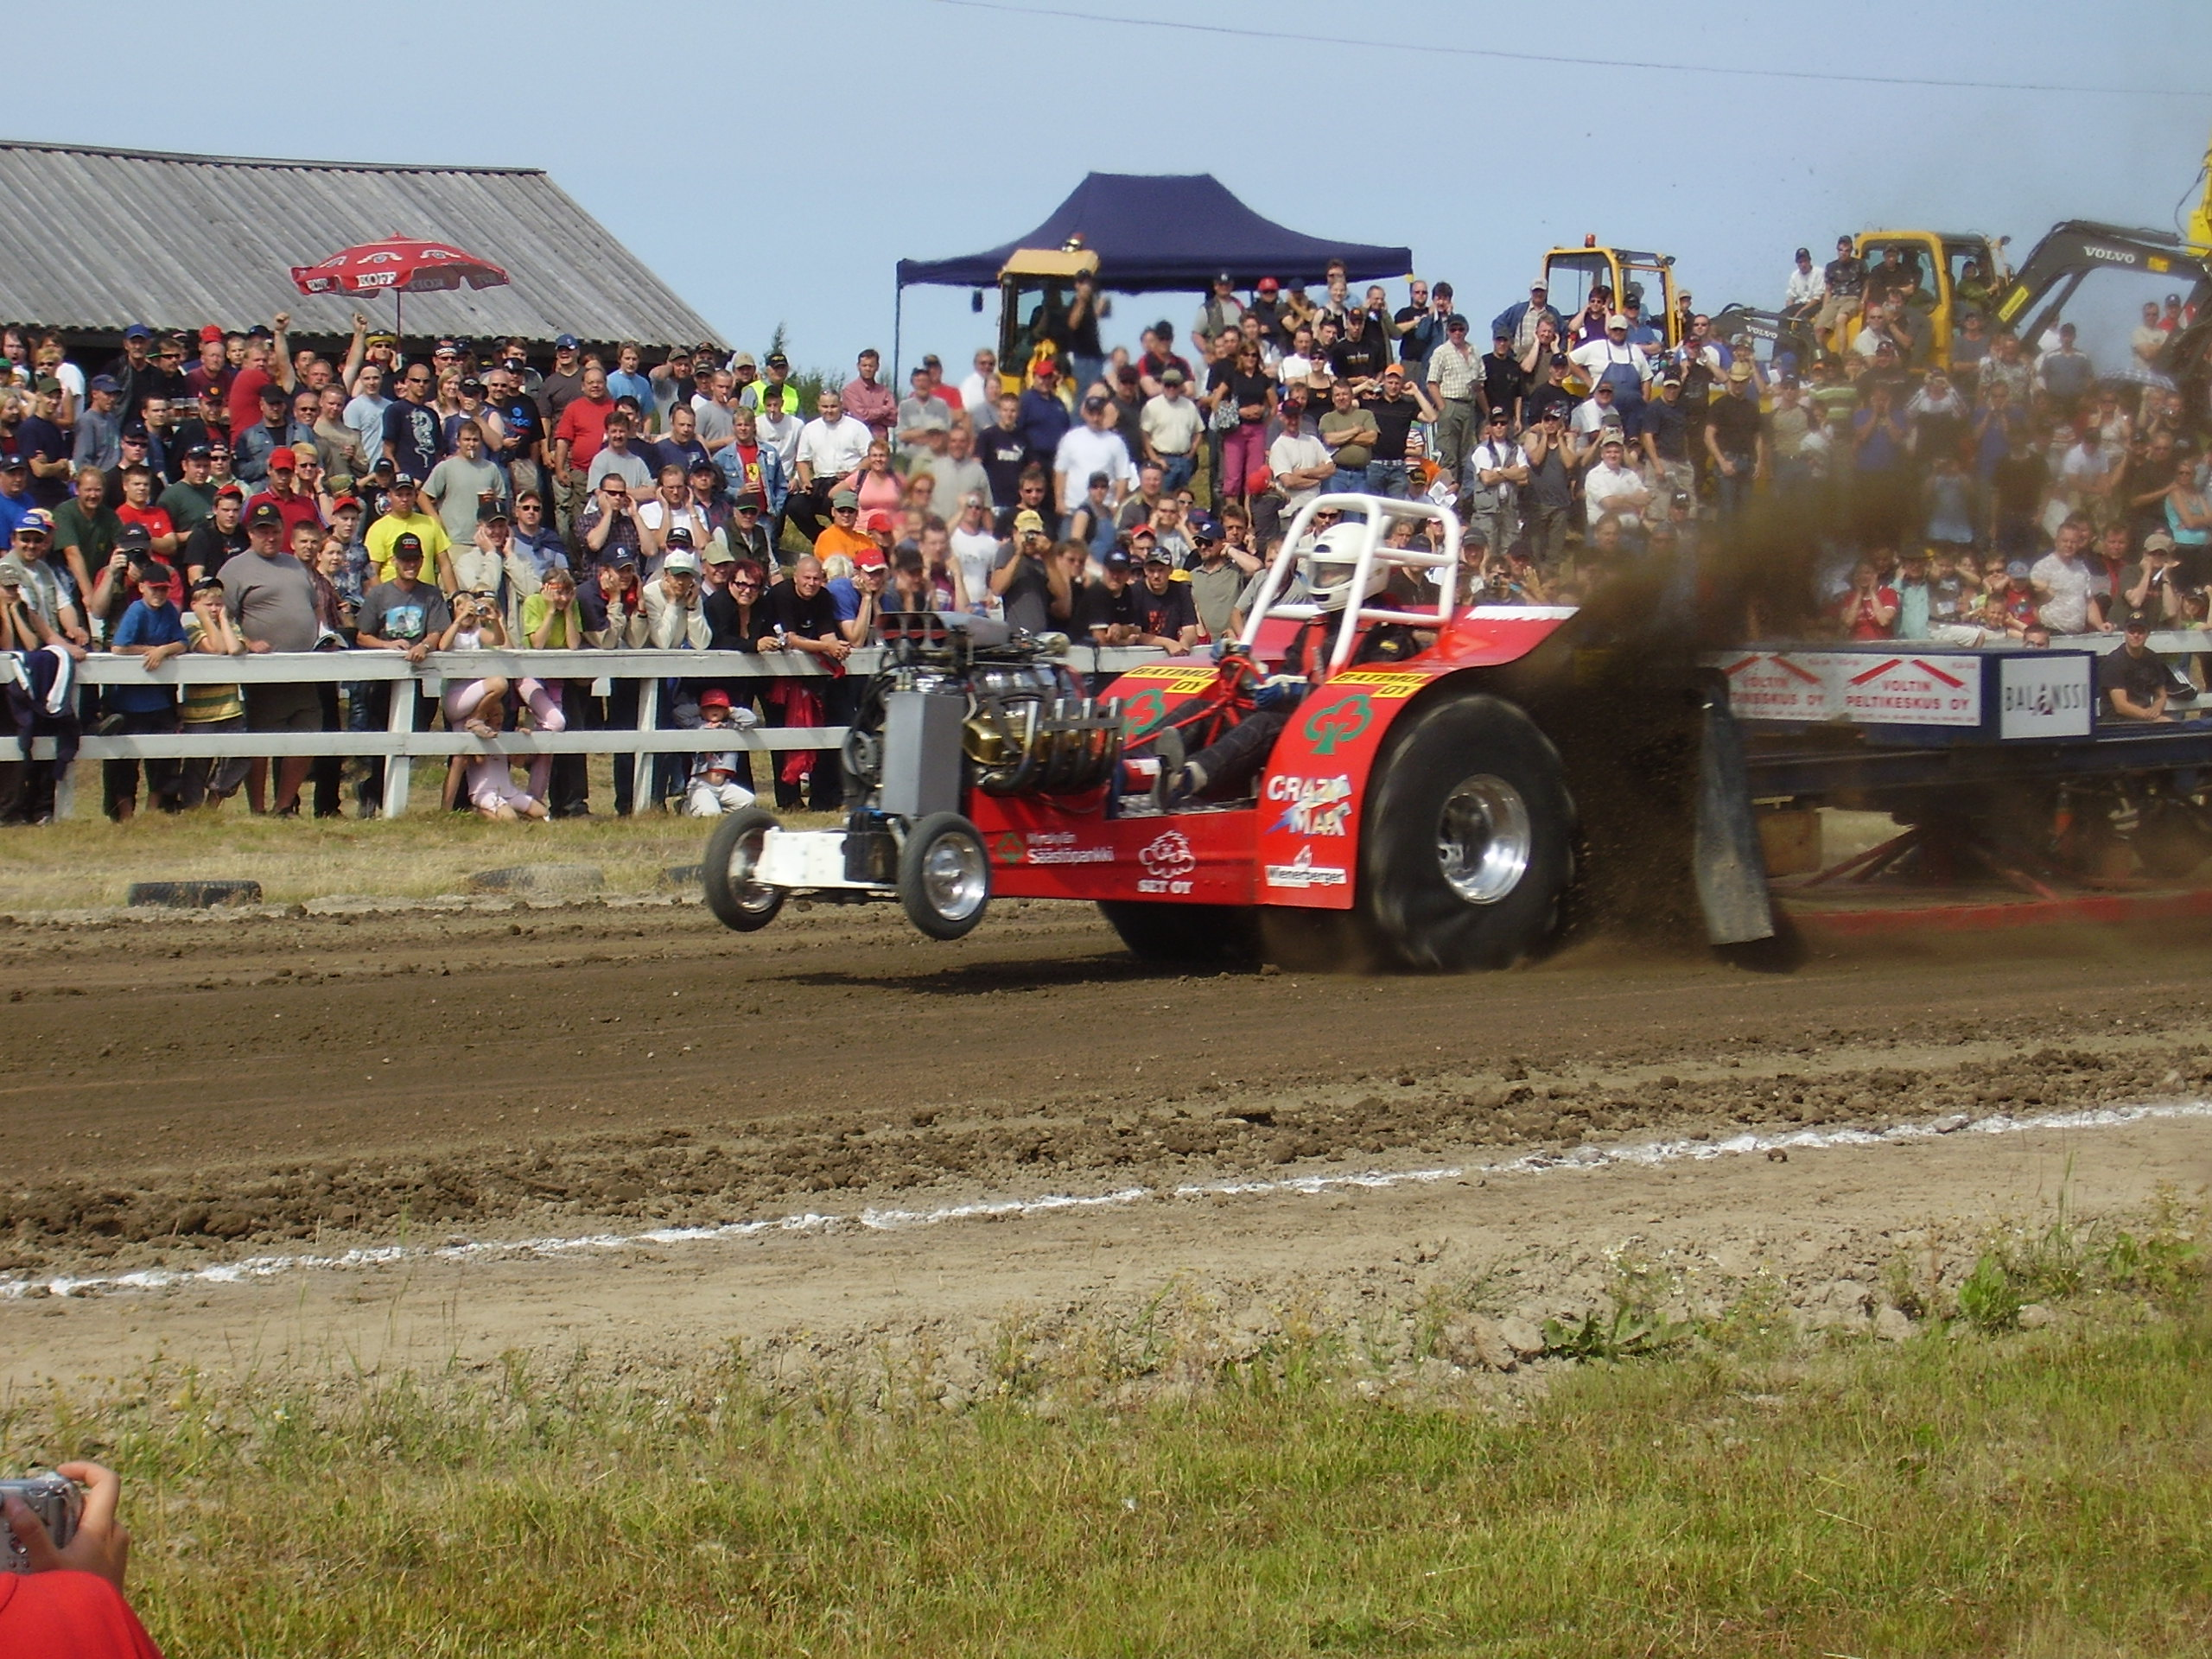 Mini Mod Tractor Pulling : File finnish tractor pulling mini modified g wikimedia